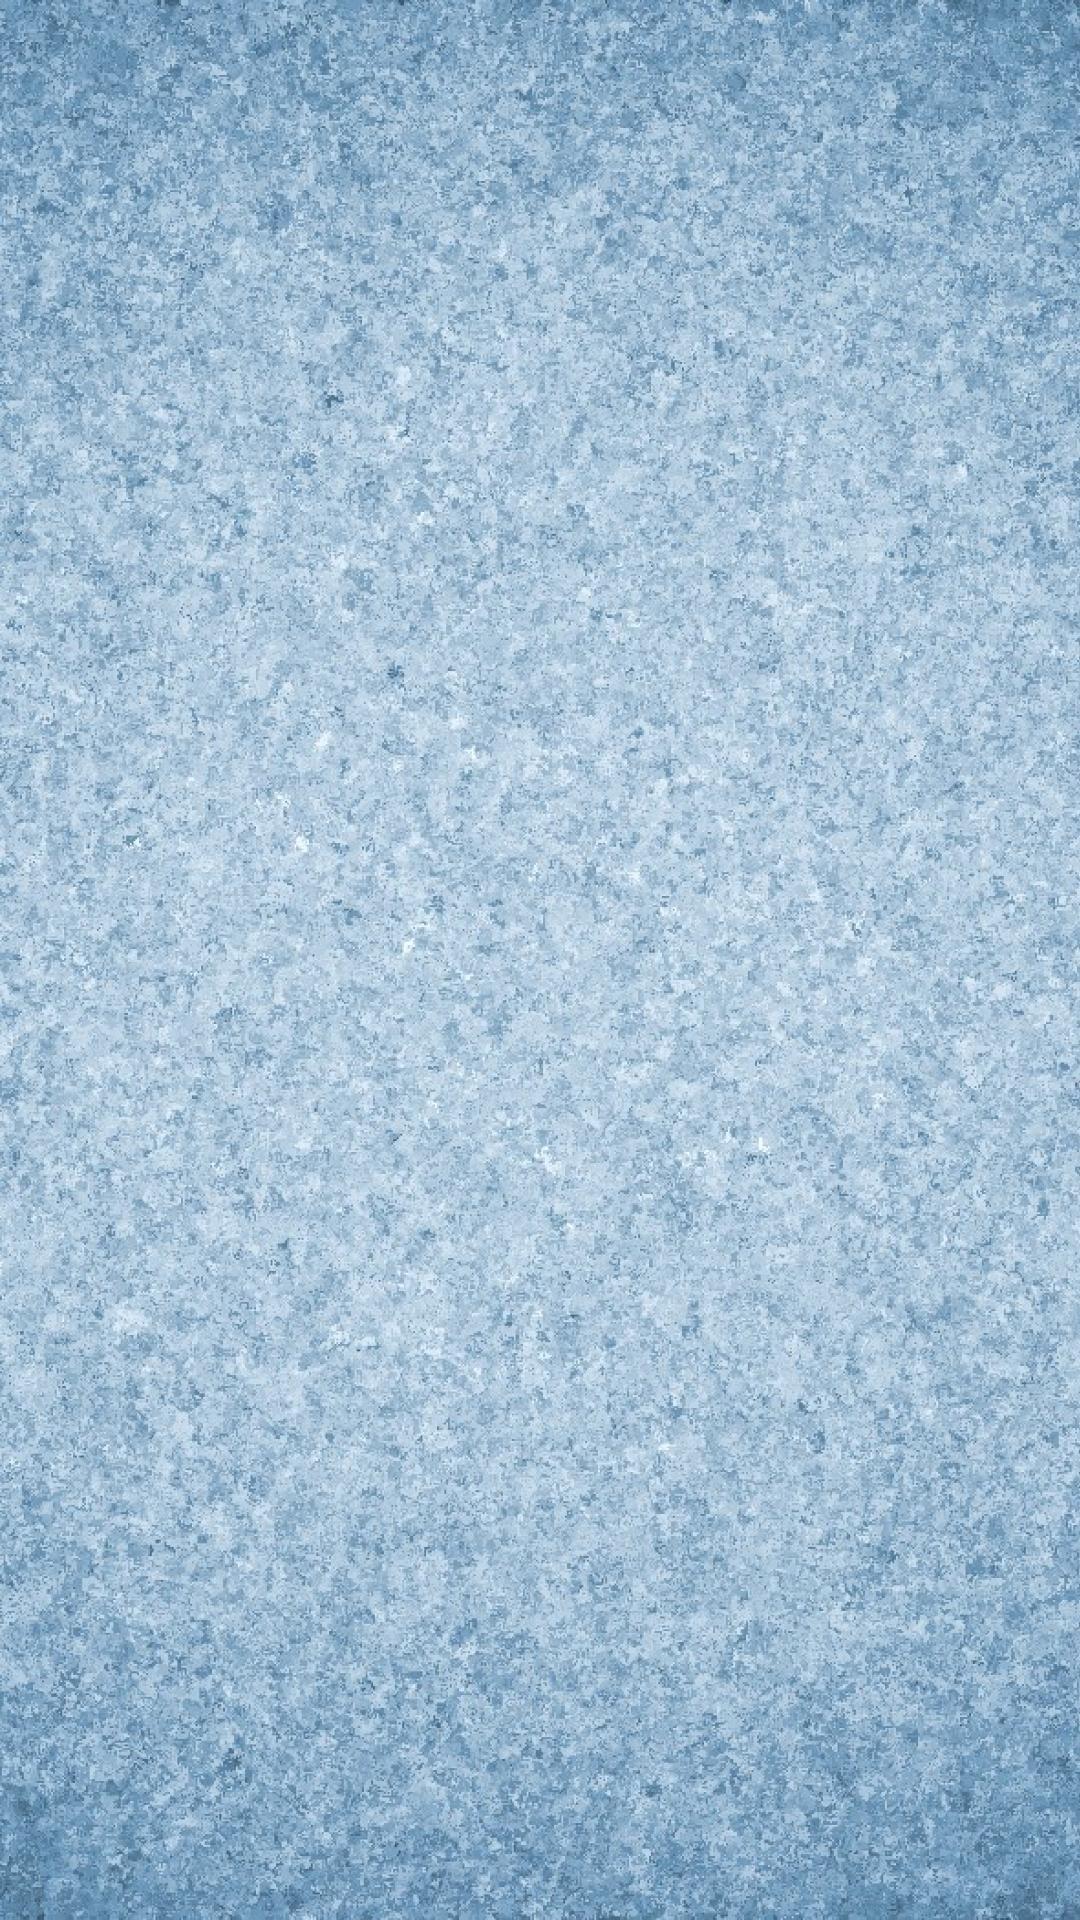 Cobalt Blue 3137775 Hd Wallpaper Backgrounds Download